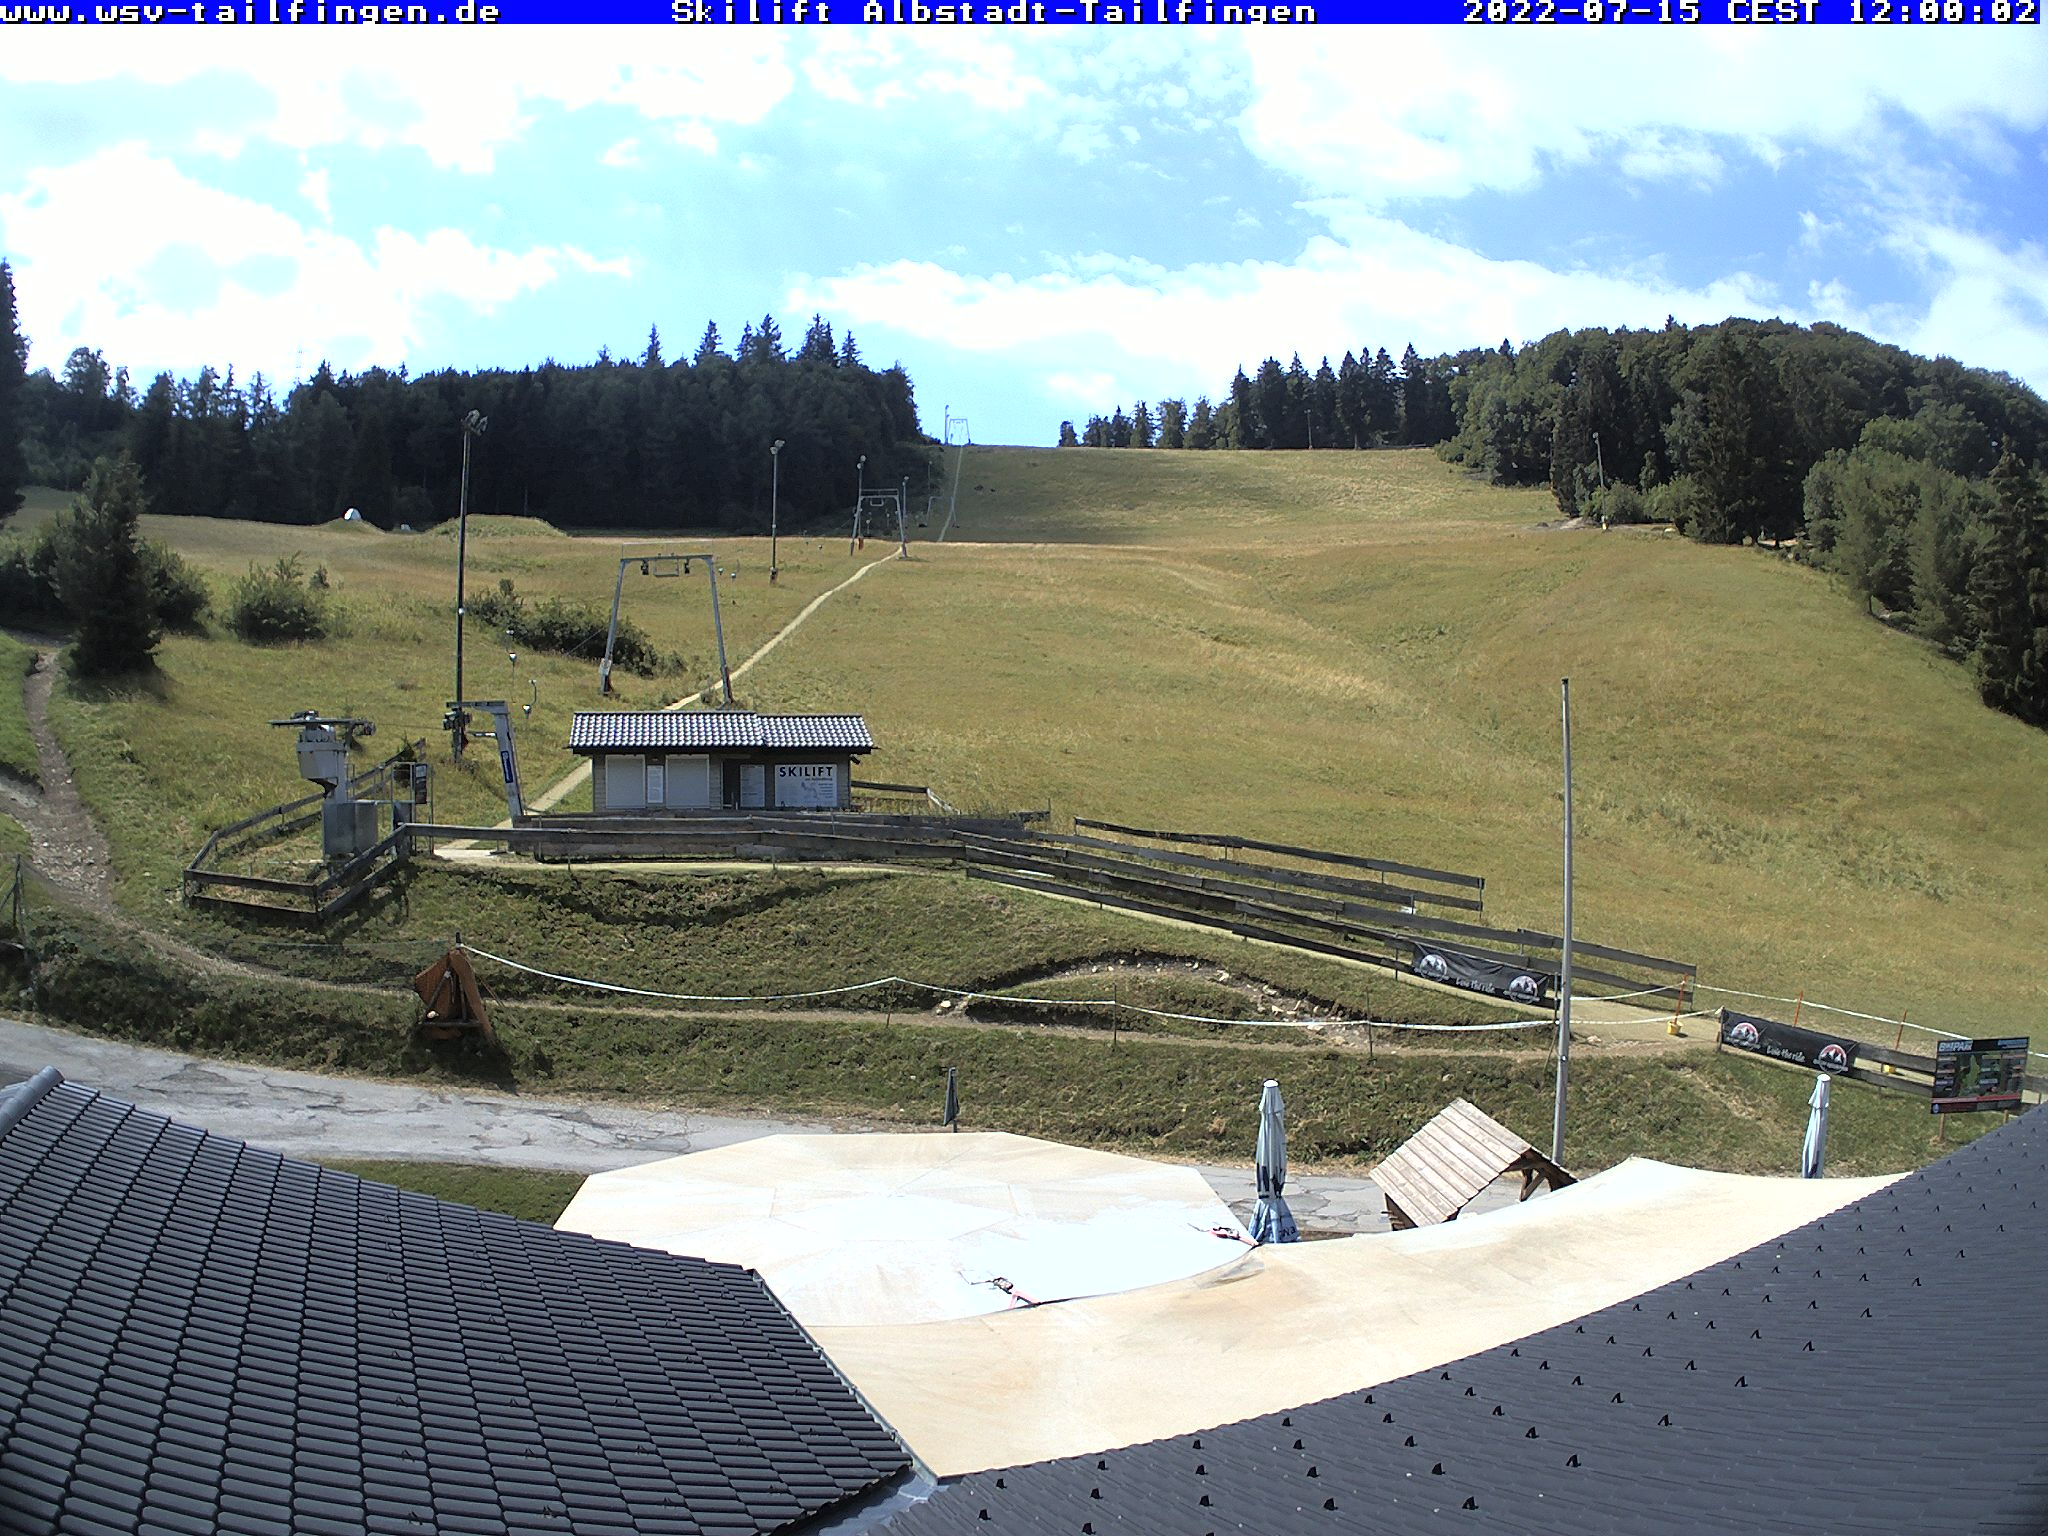 Webcam-Foto 12:00 Uhr / Skilift Albstadt-Tailfingen